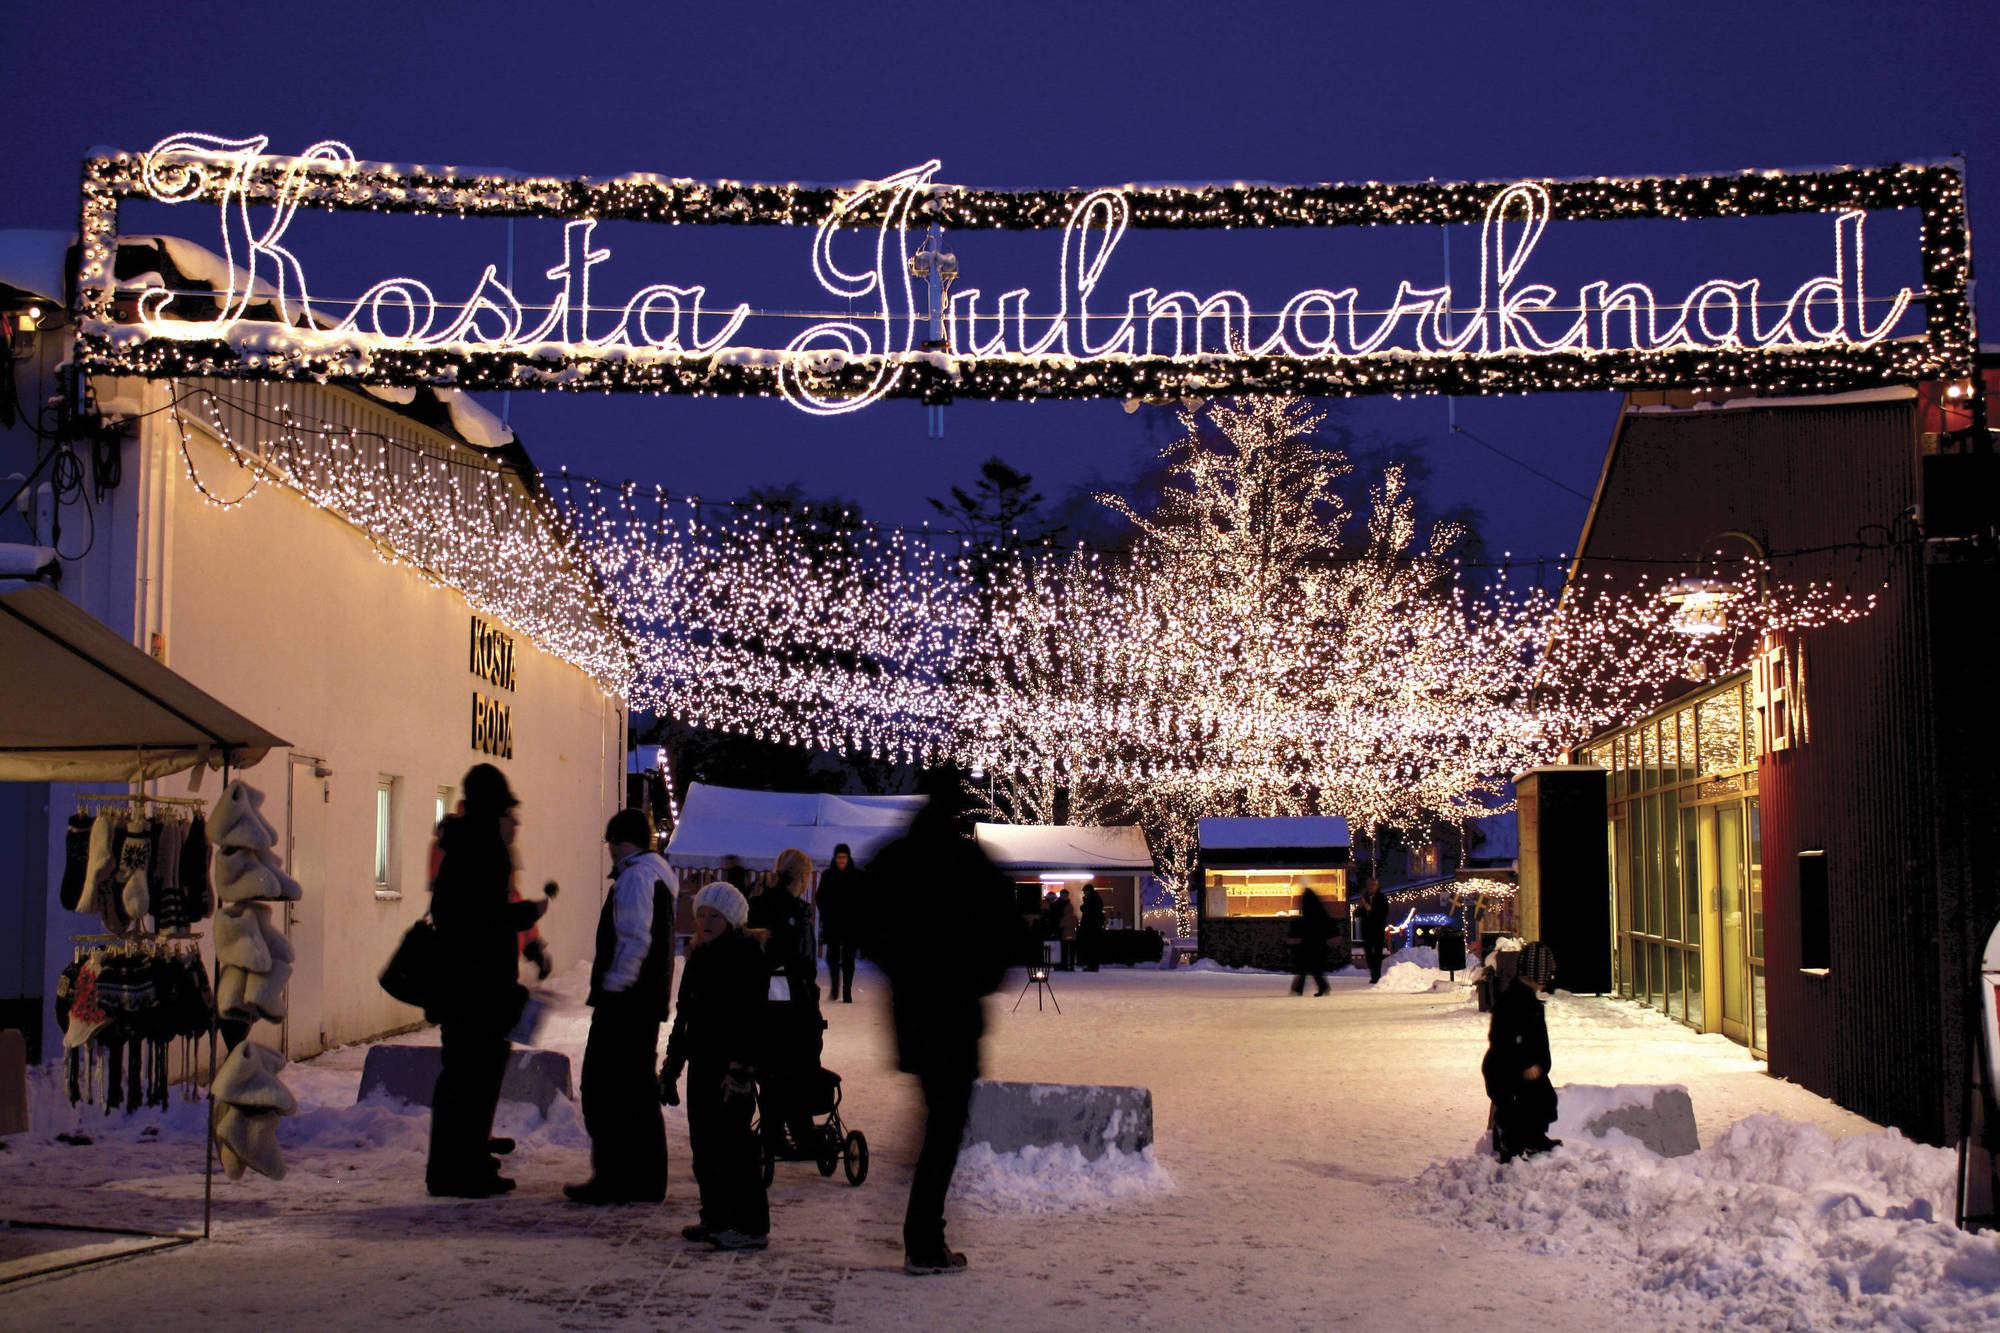 visitsmaland_weihnachtsmark-julmarknad-jul-i-kosta9257_kosta-jul-edb8fdd718c606fa6ce47dbf4421be65-2000x1333.jpg